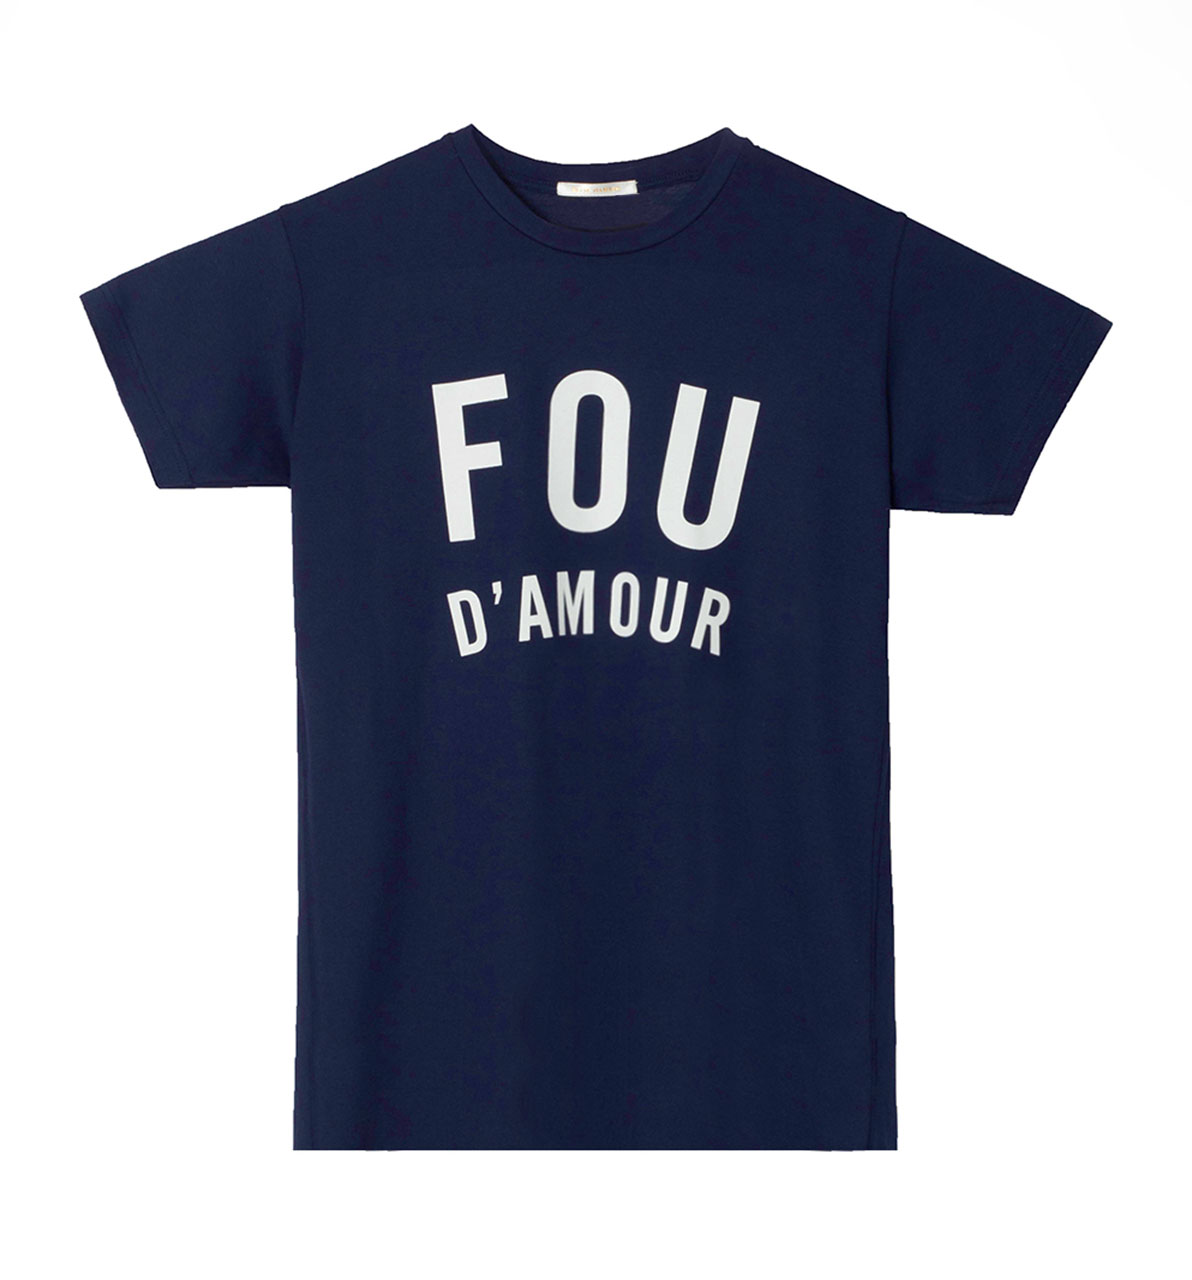 Fou-D-Amour-Elise-Hameau-Oversized.jpg